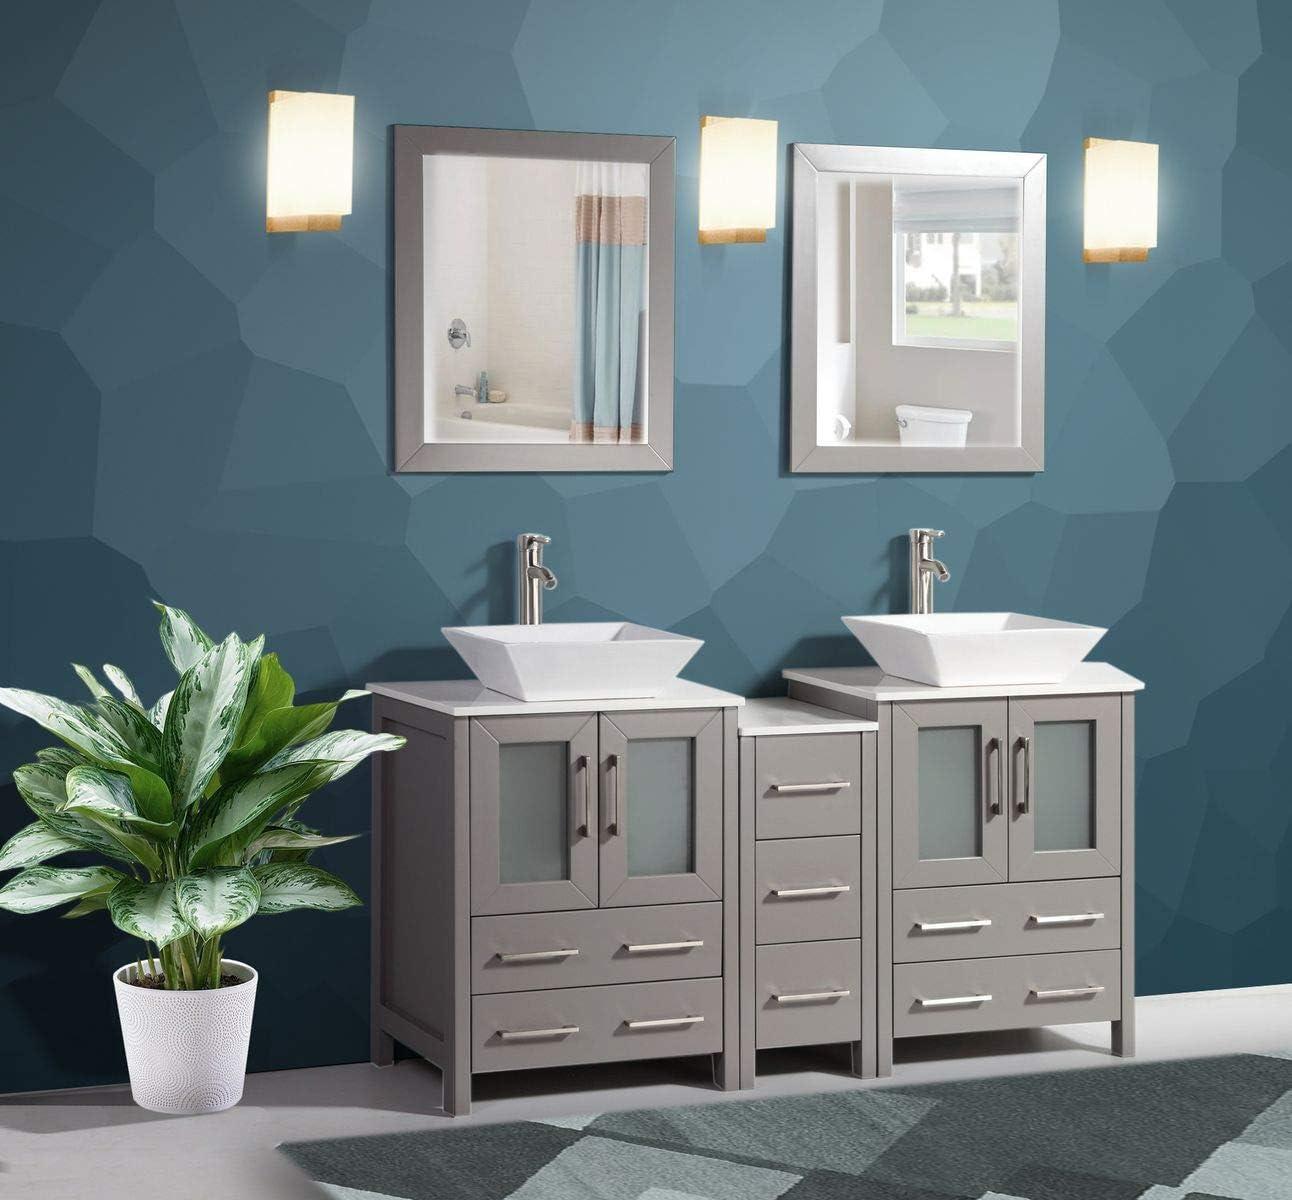 Amazon Com Vanity Art 60 Inch Double Sink Bathroom Vanity Compact Set 3 Cabinets 2 Shelves 7 Drawers Quartz Top And Ceramic Vessel Sink Bathroom Cabinet With Free Mirror Va3124 60 G Kitchen Dining